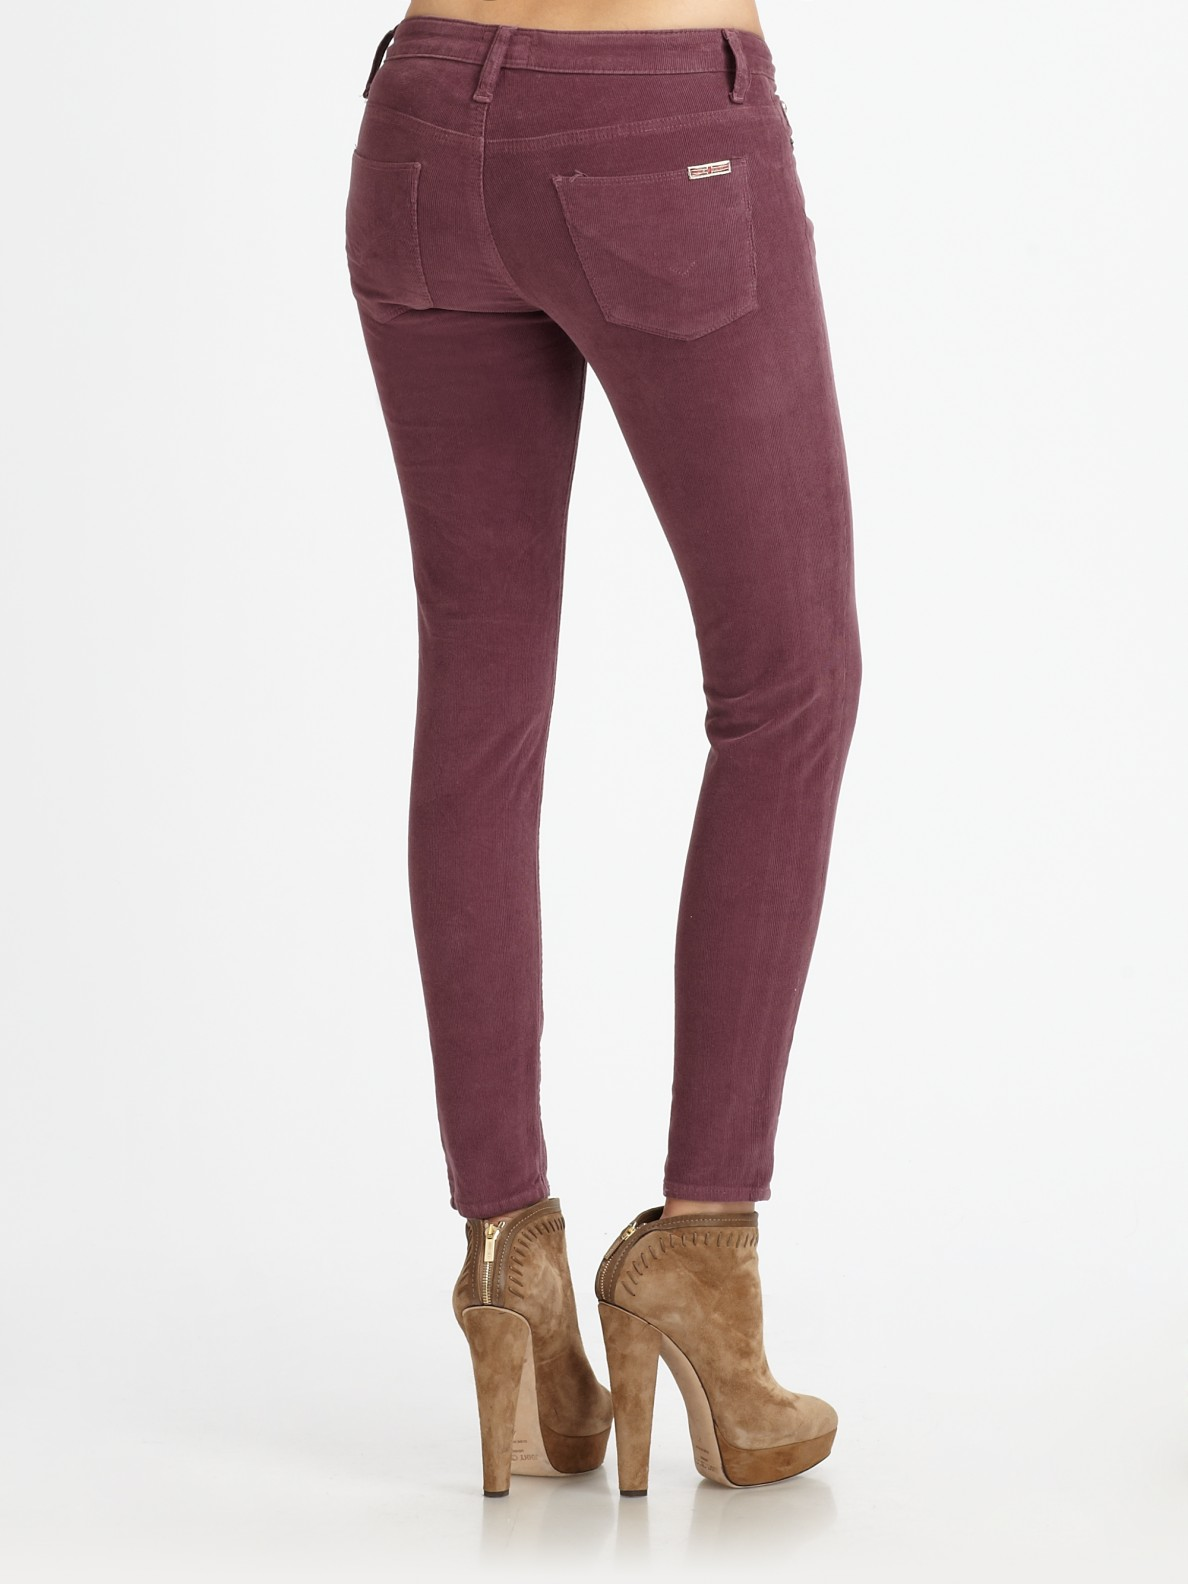 Boot Cut Jeans Mens